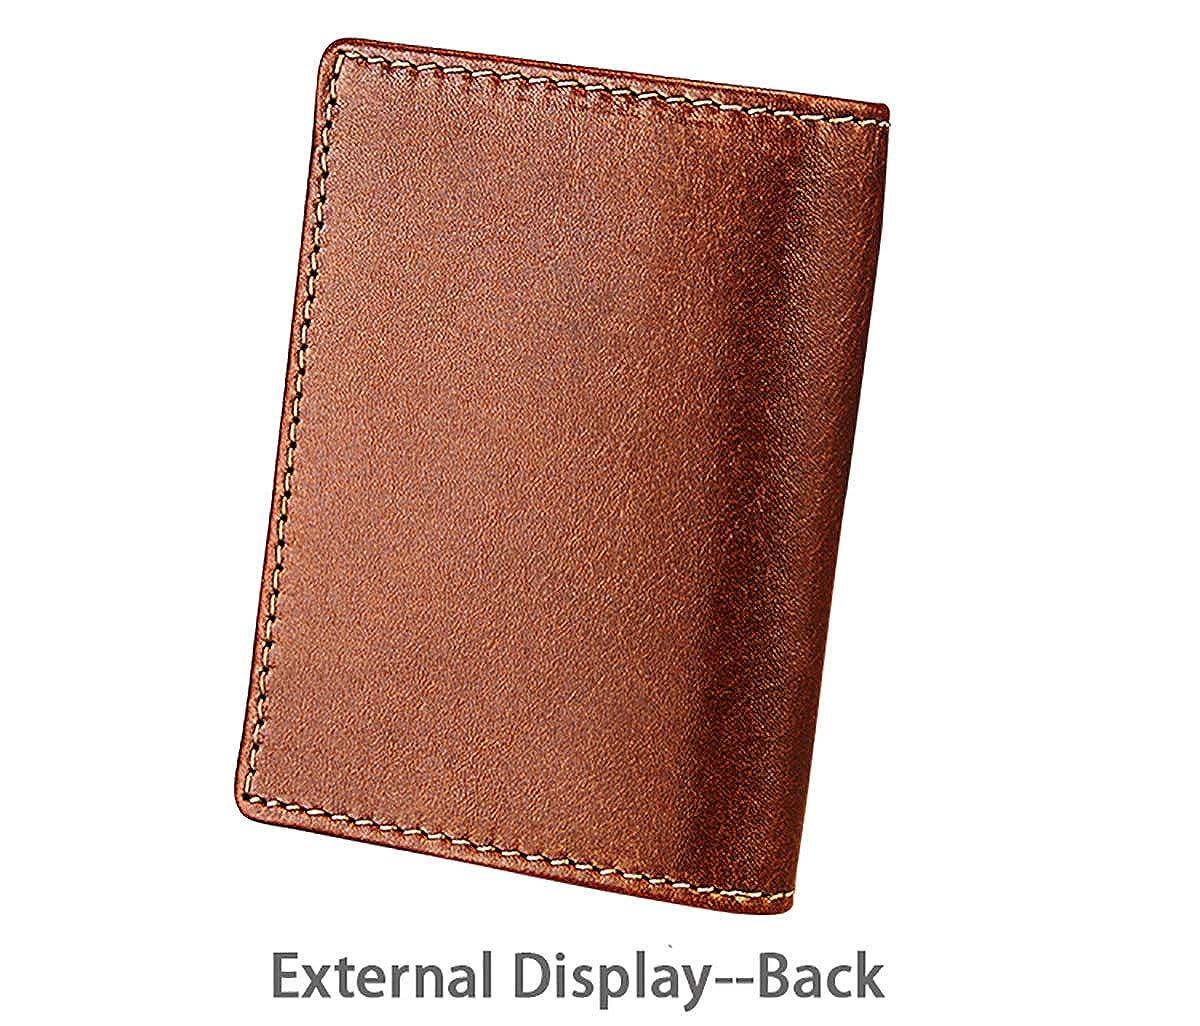 Handmade OX Leather Front Pocket Holder Mini Bifold Credit Card Purse Cosarmo Mens Wallet,Slim RFID blocking Wallet for Men